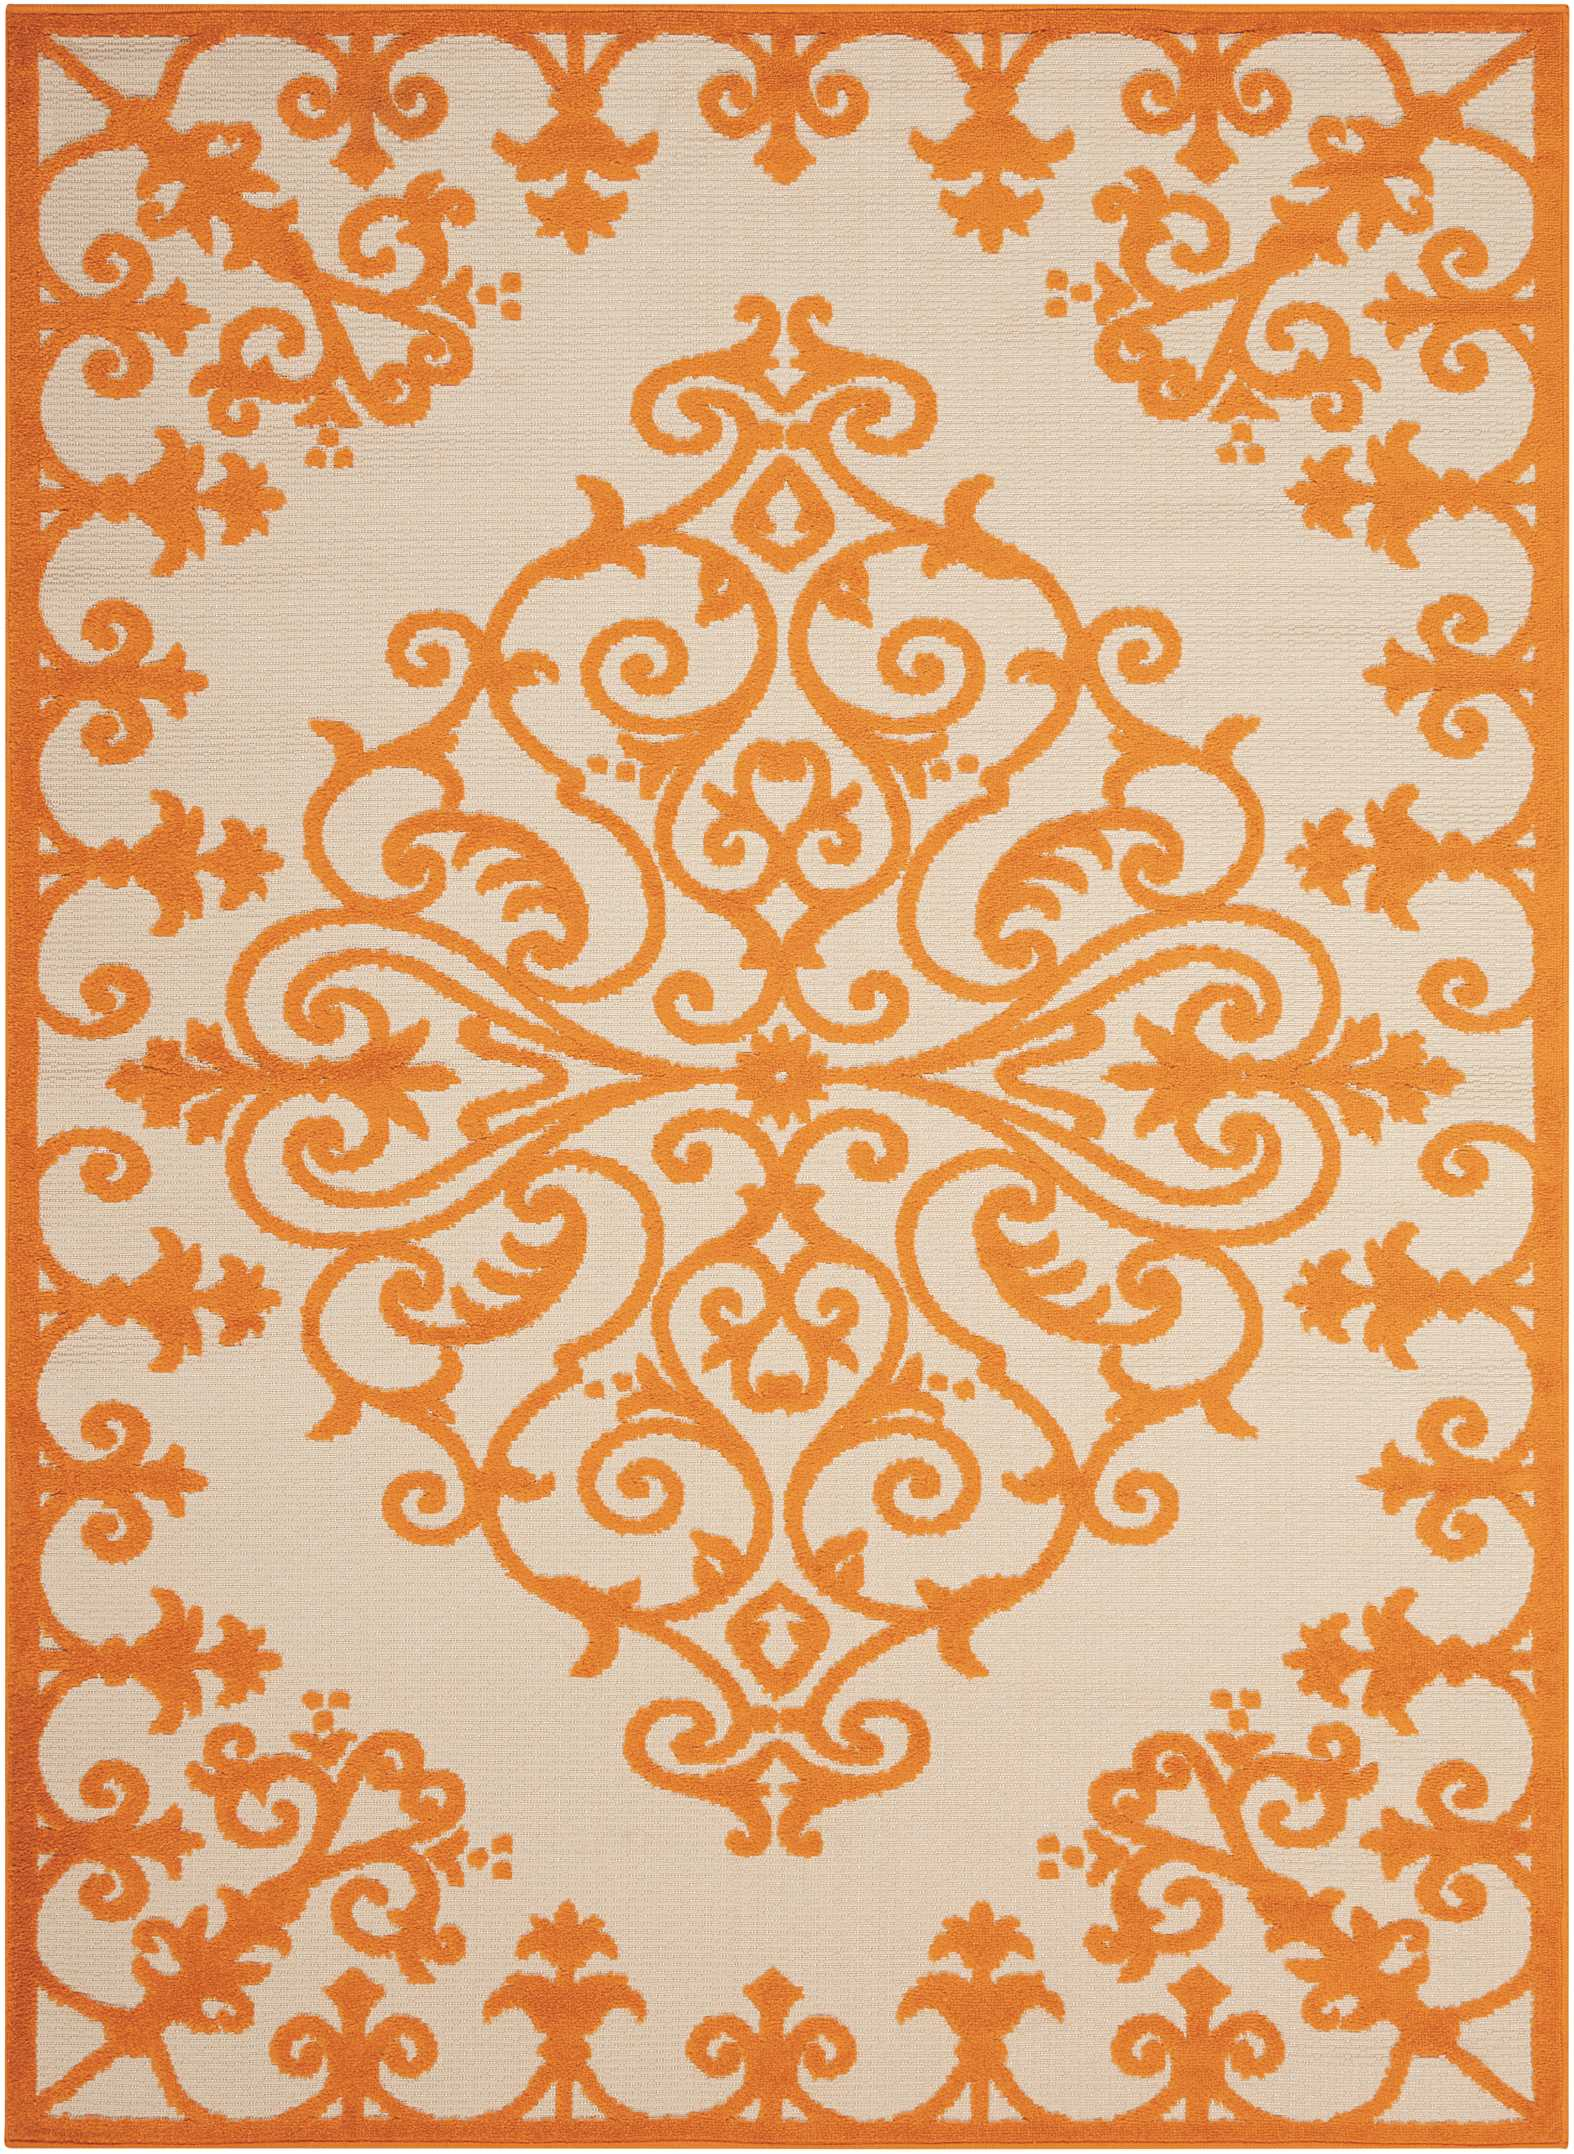 Nourison Aloha 4'X6' Orange And White Textured  Indoor-Outdoor Rug